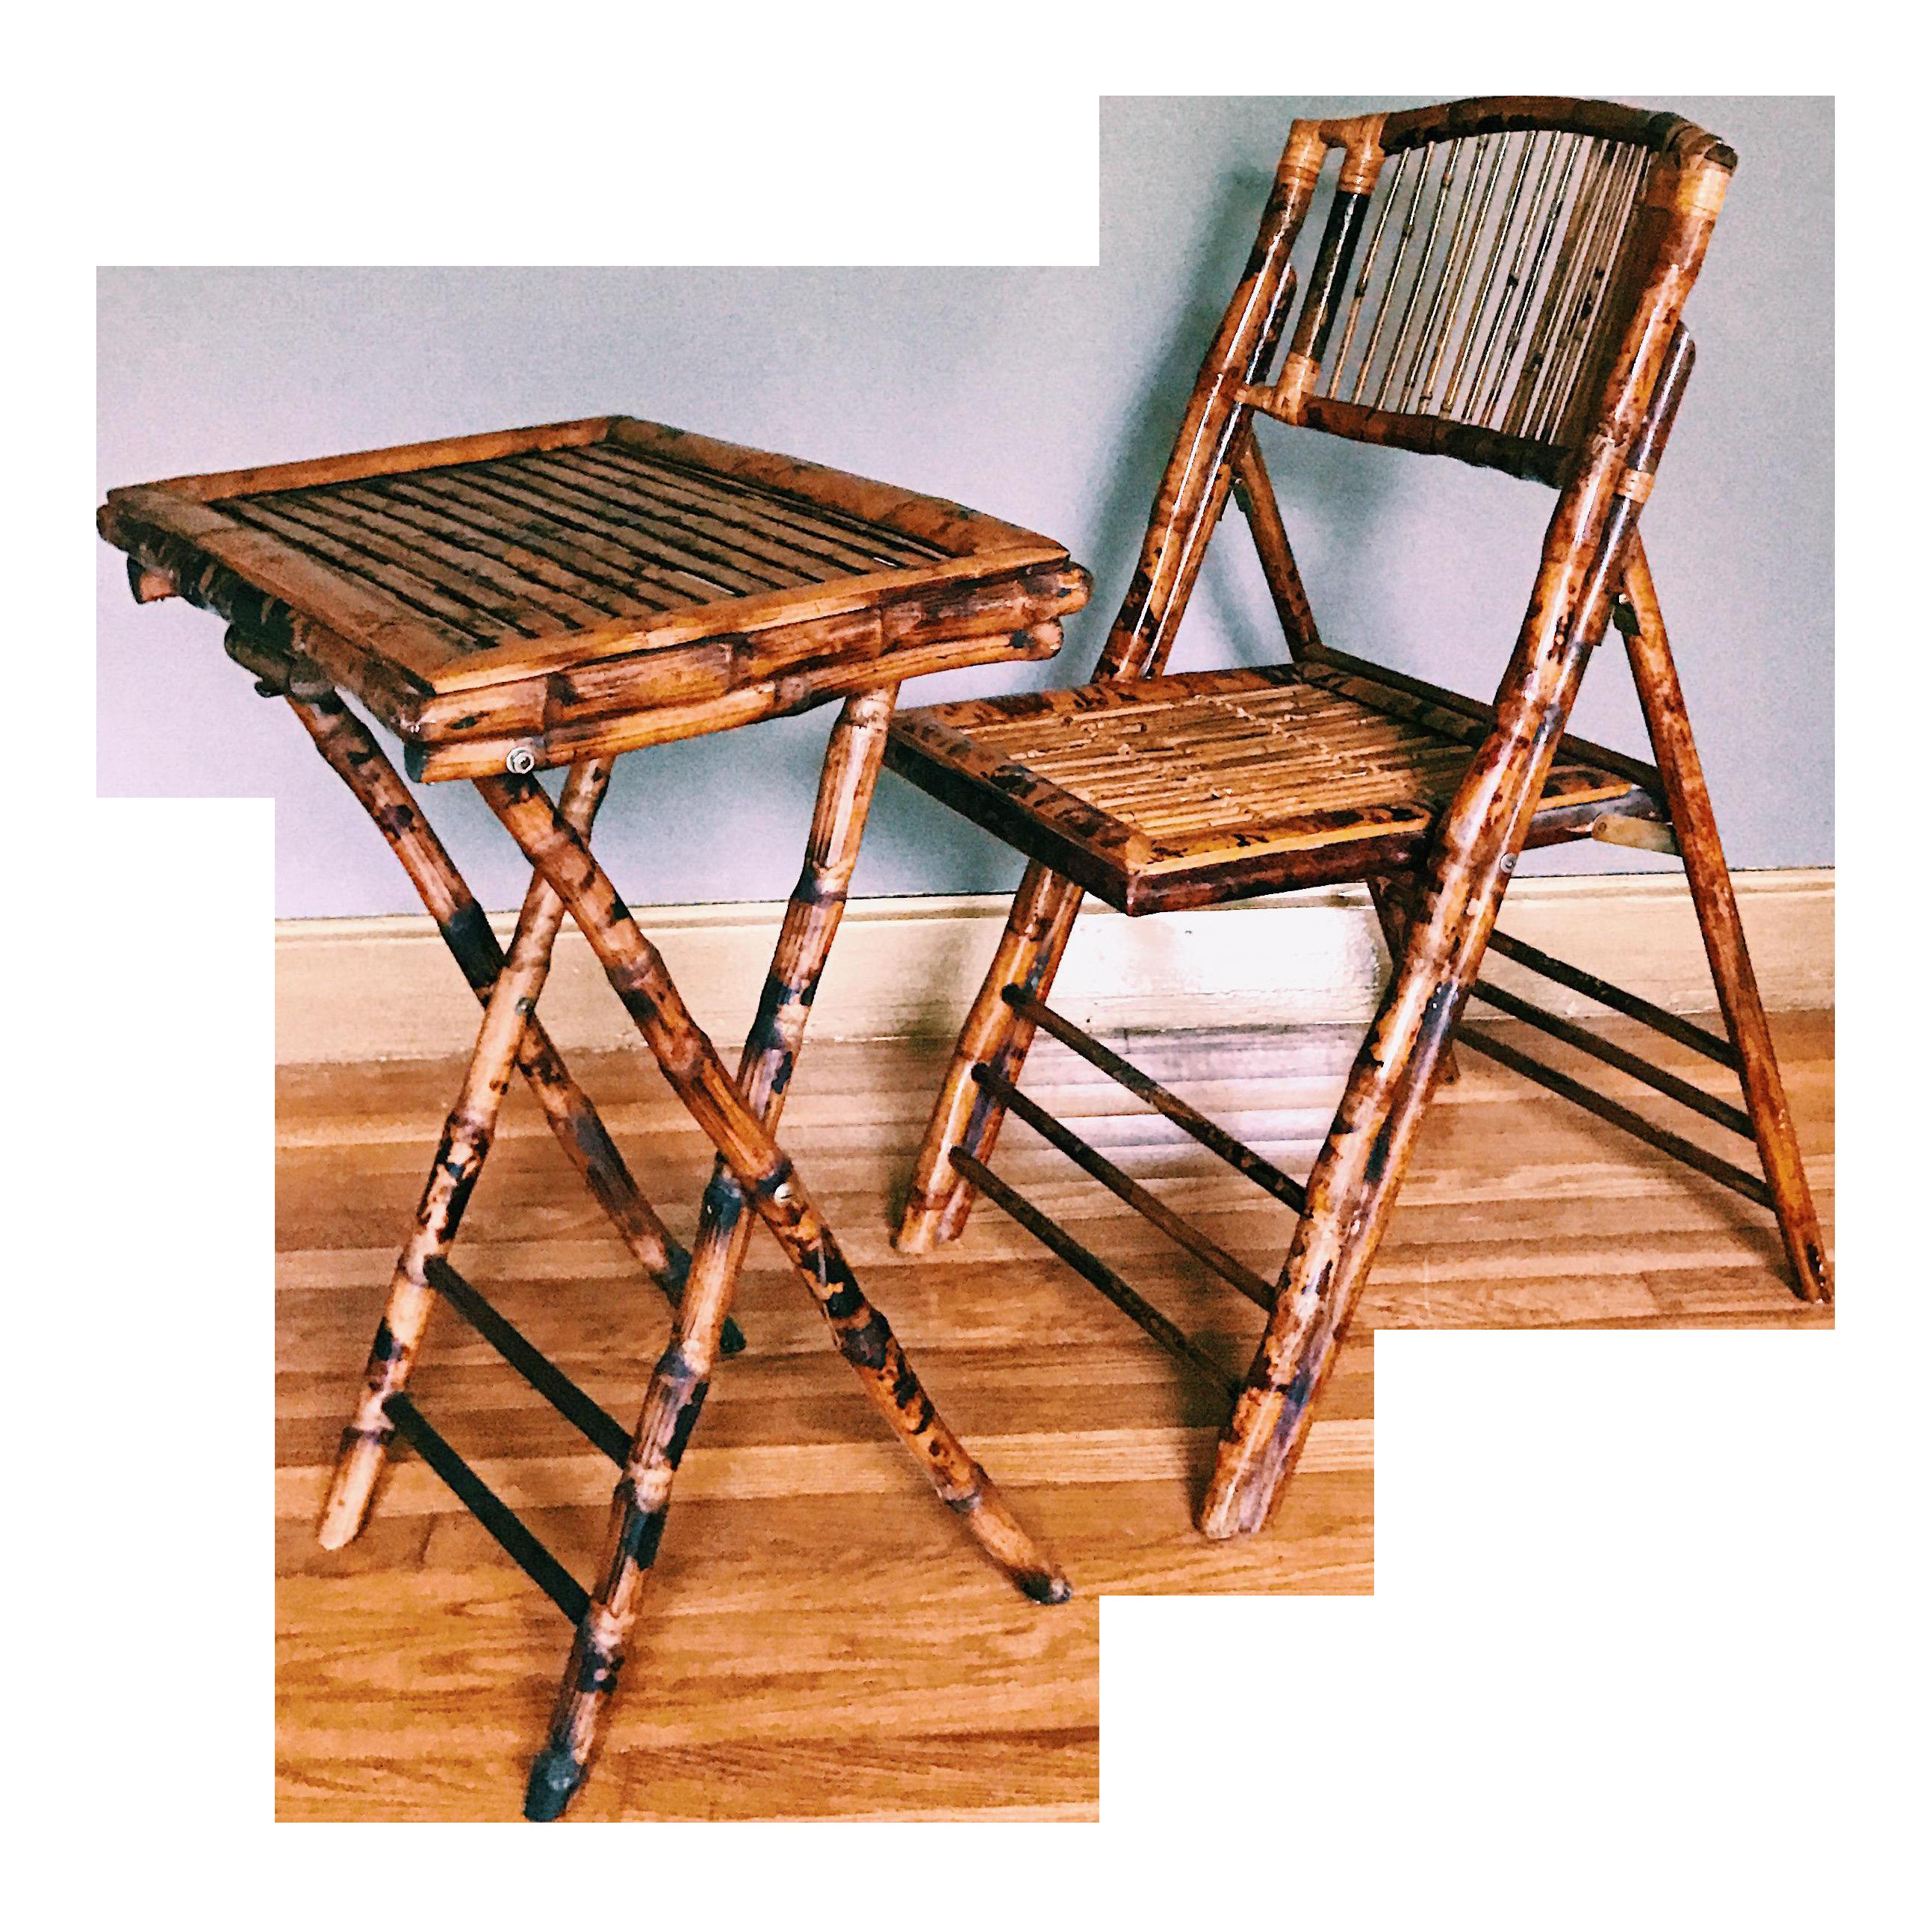 Vintage Burnt Tortoise Bamboo Folding Chair U0026 Tray   Image 1 ...